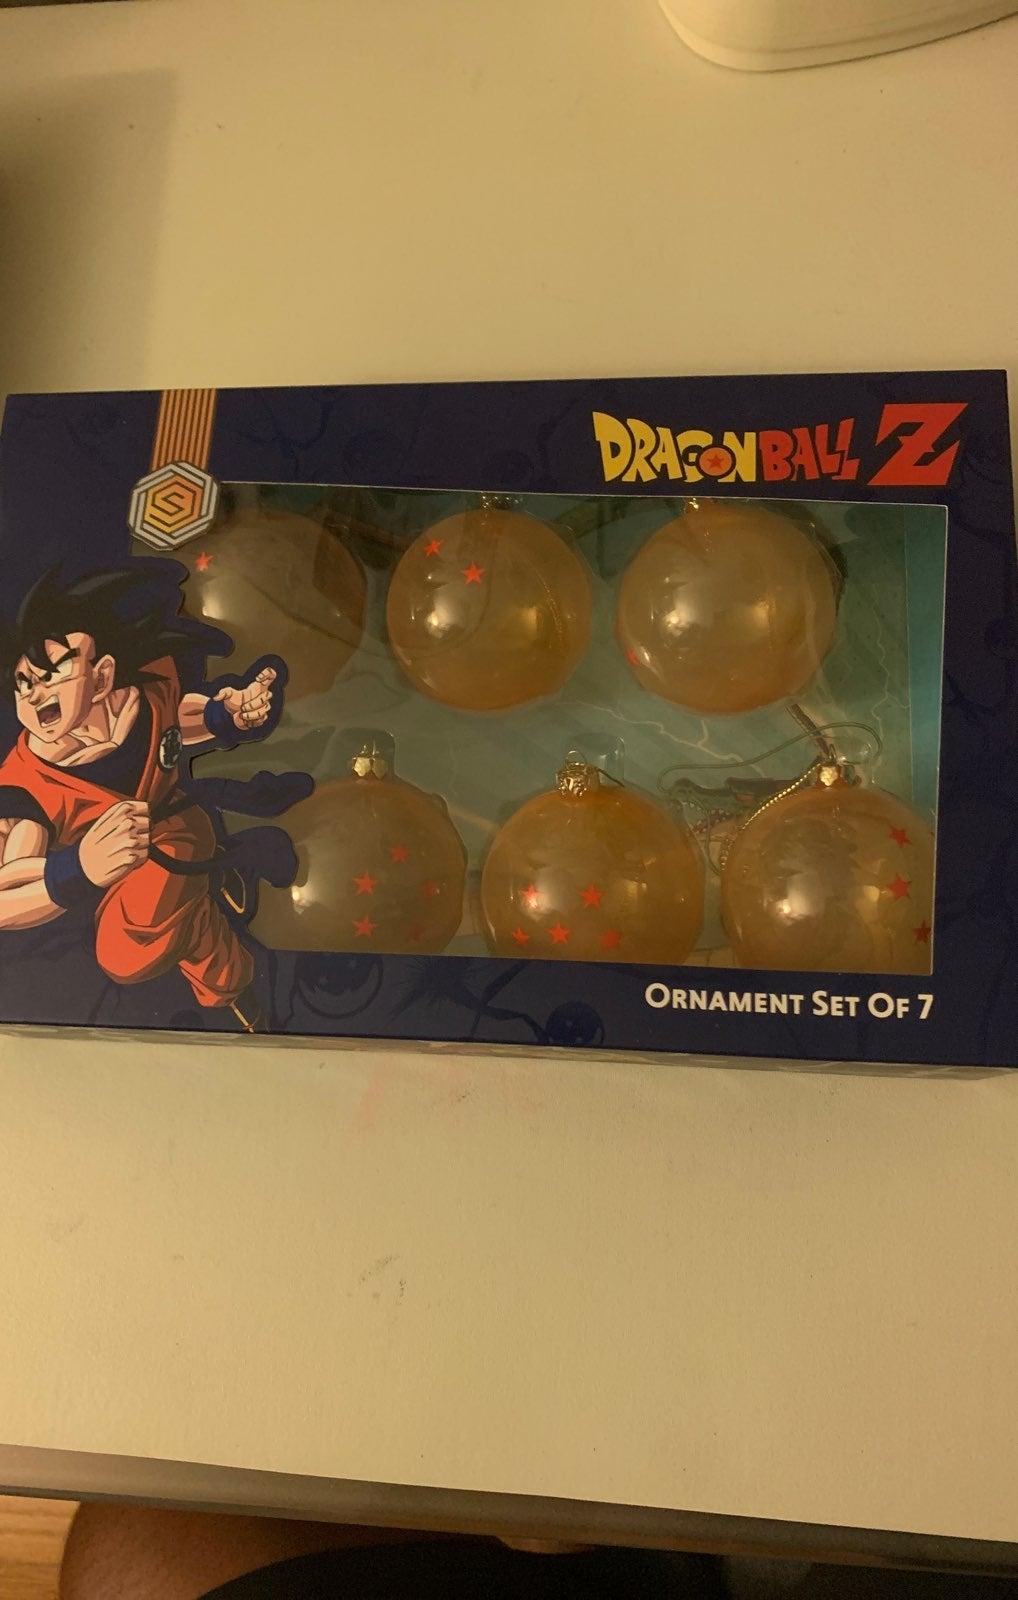 Dragon Ball Z ORNAMENT SET OF 7